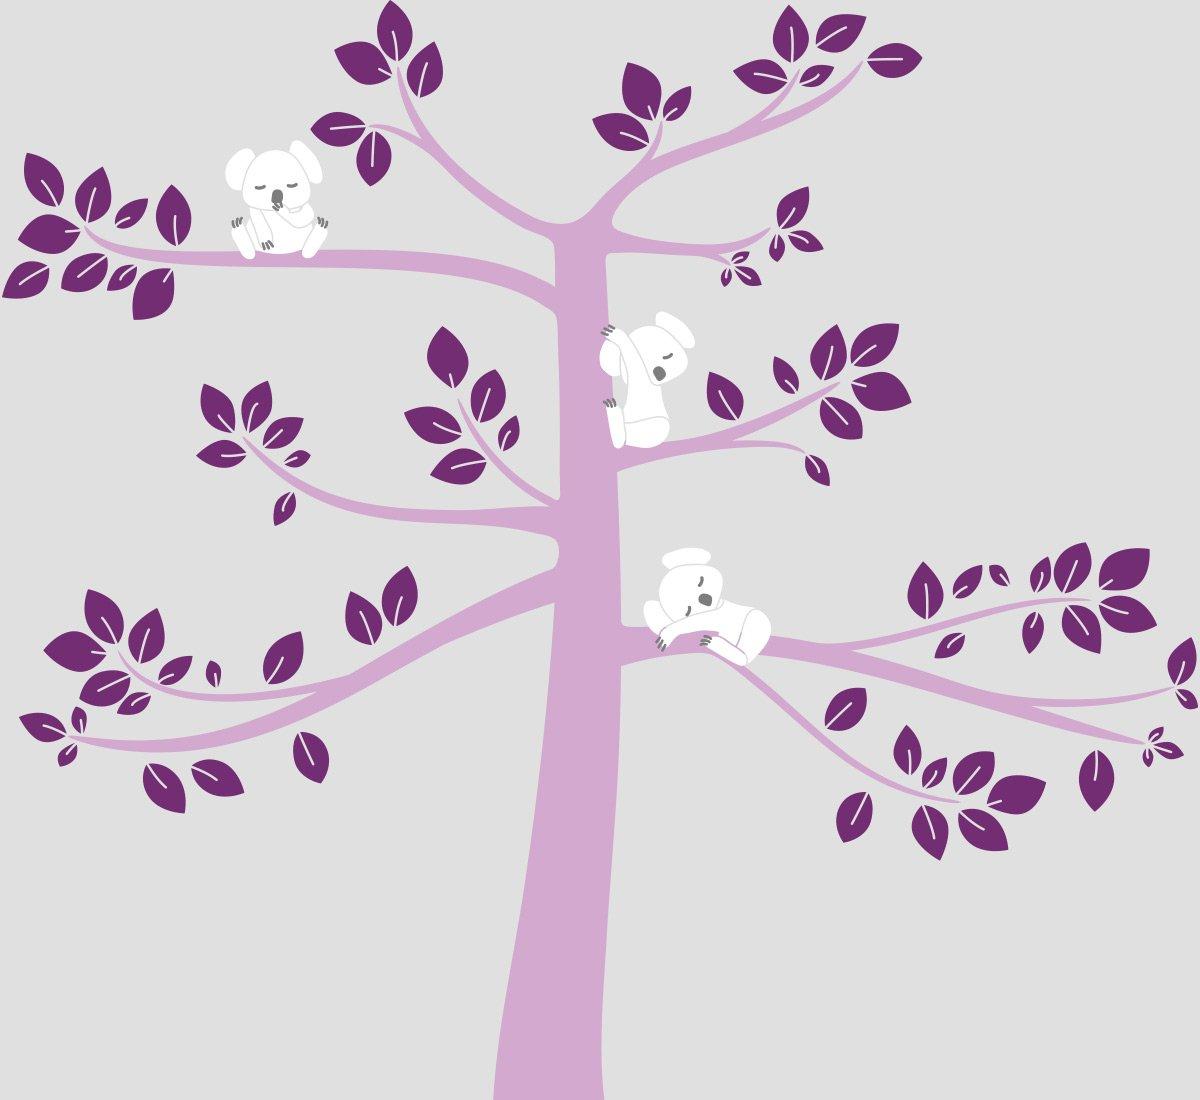 Light Brown//Violet//Lilac//Charcoal 148050081040042073000000-OB LittleLion Studio 148050081040042073000000 Modern Koala Cuteness Wall Decal